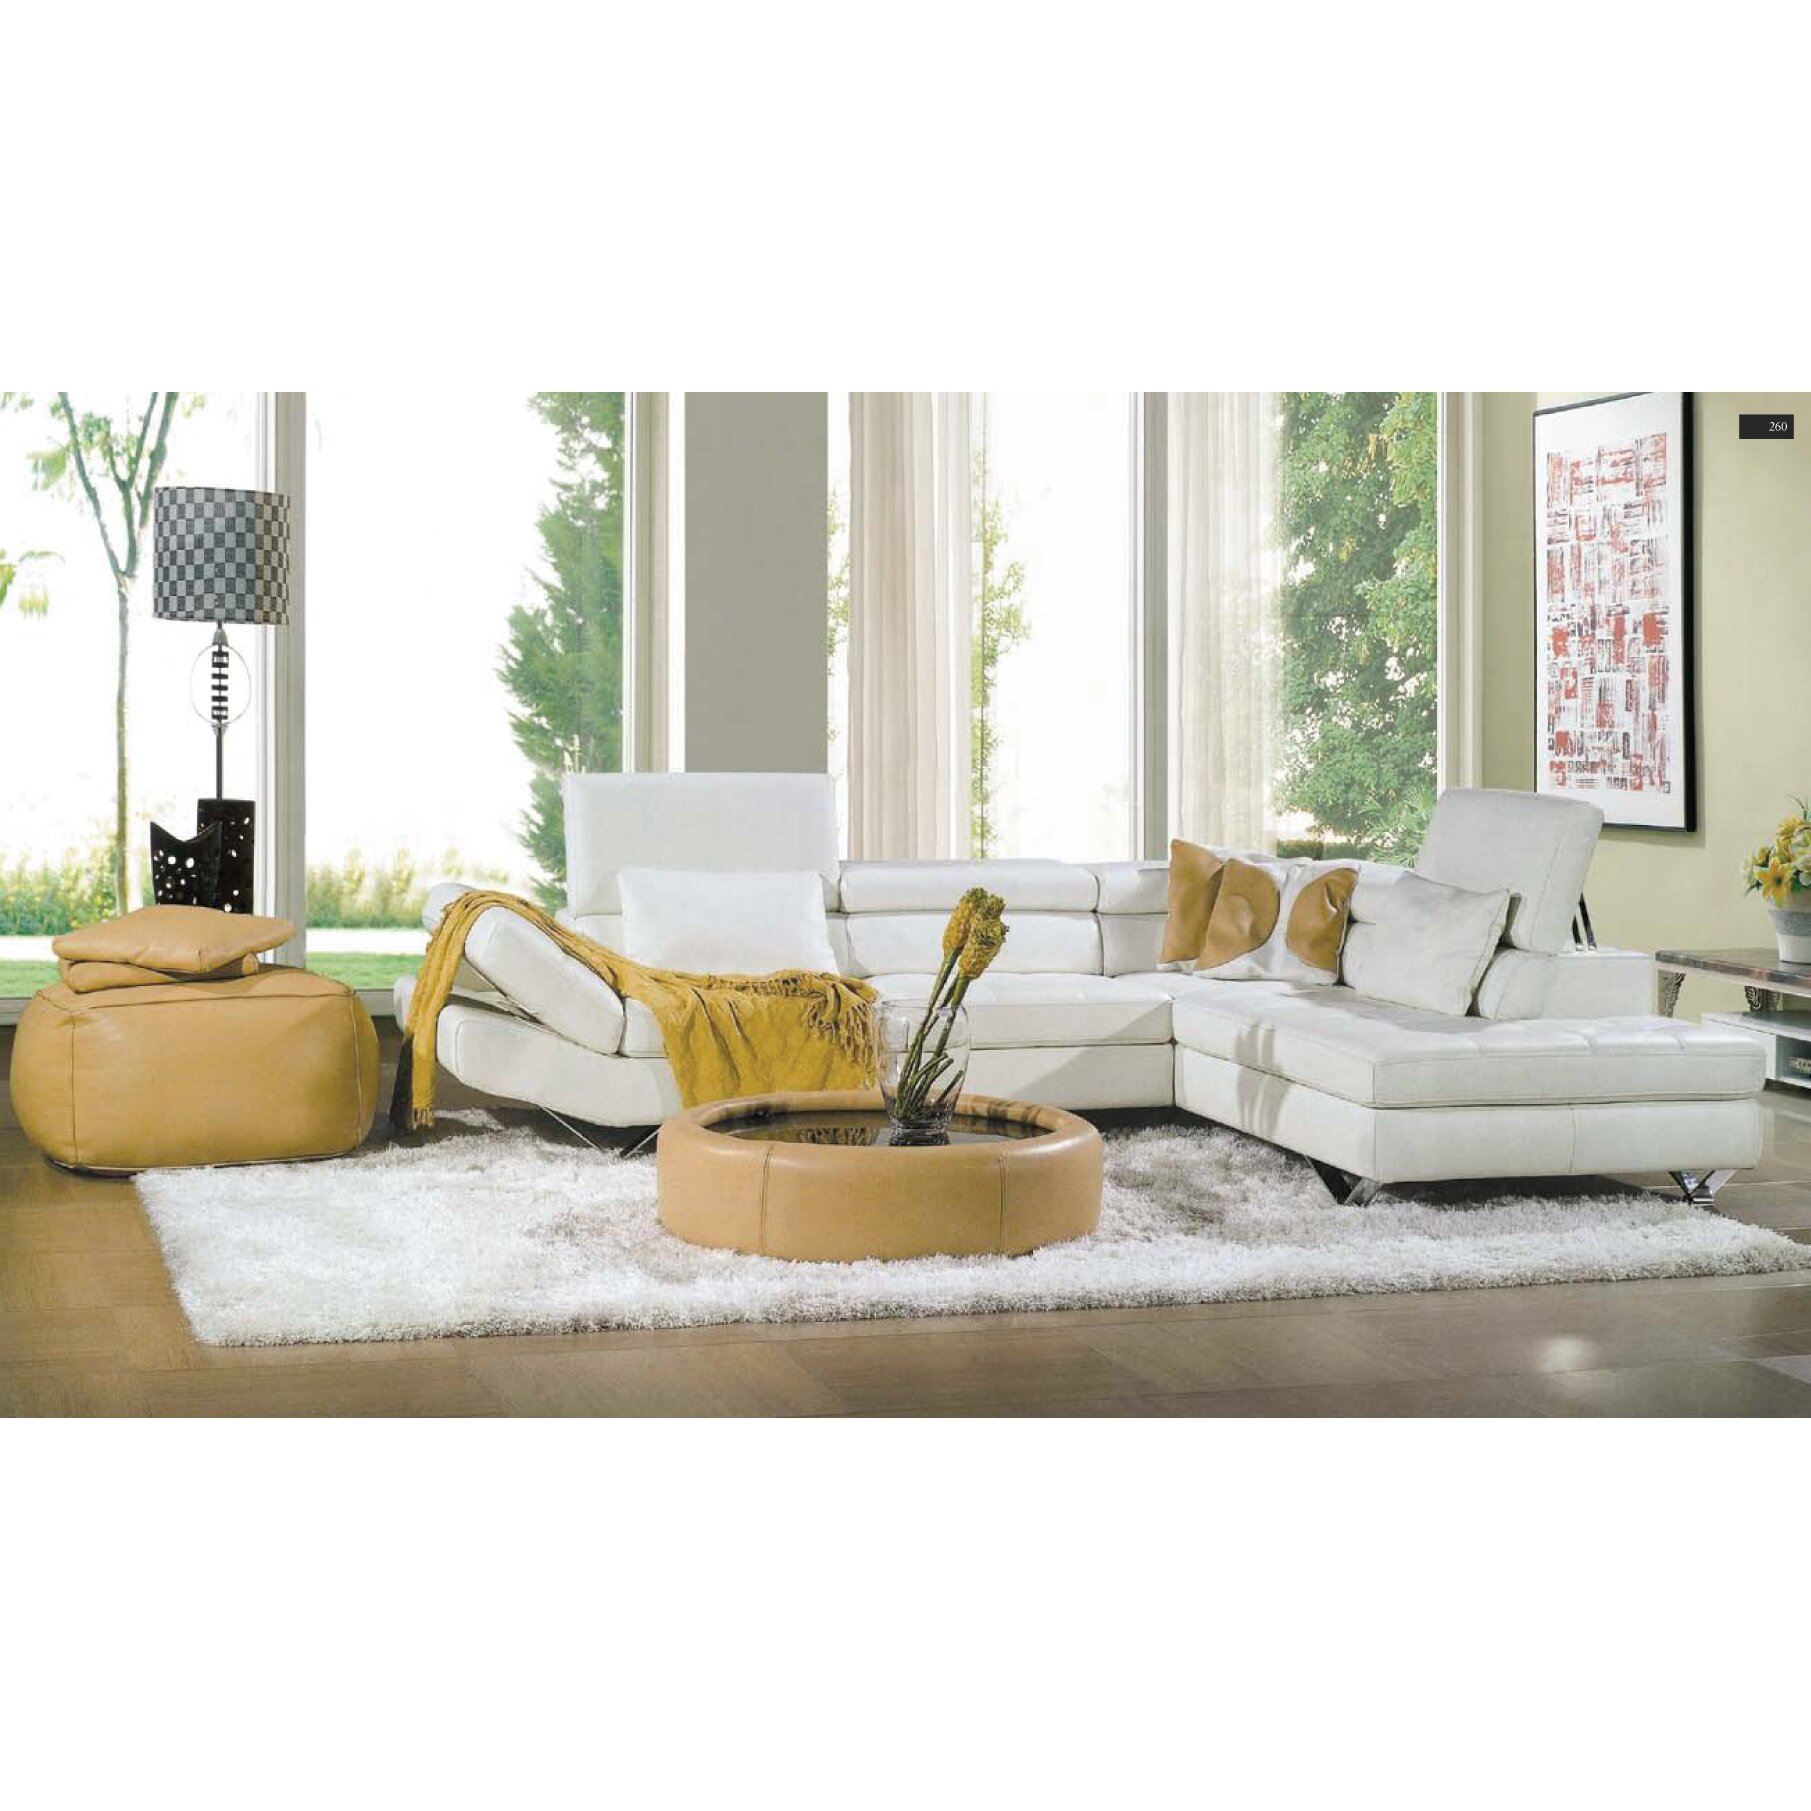 Hokku designs reims sectional reviews for Hokku designs living room furniture